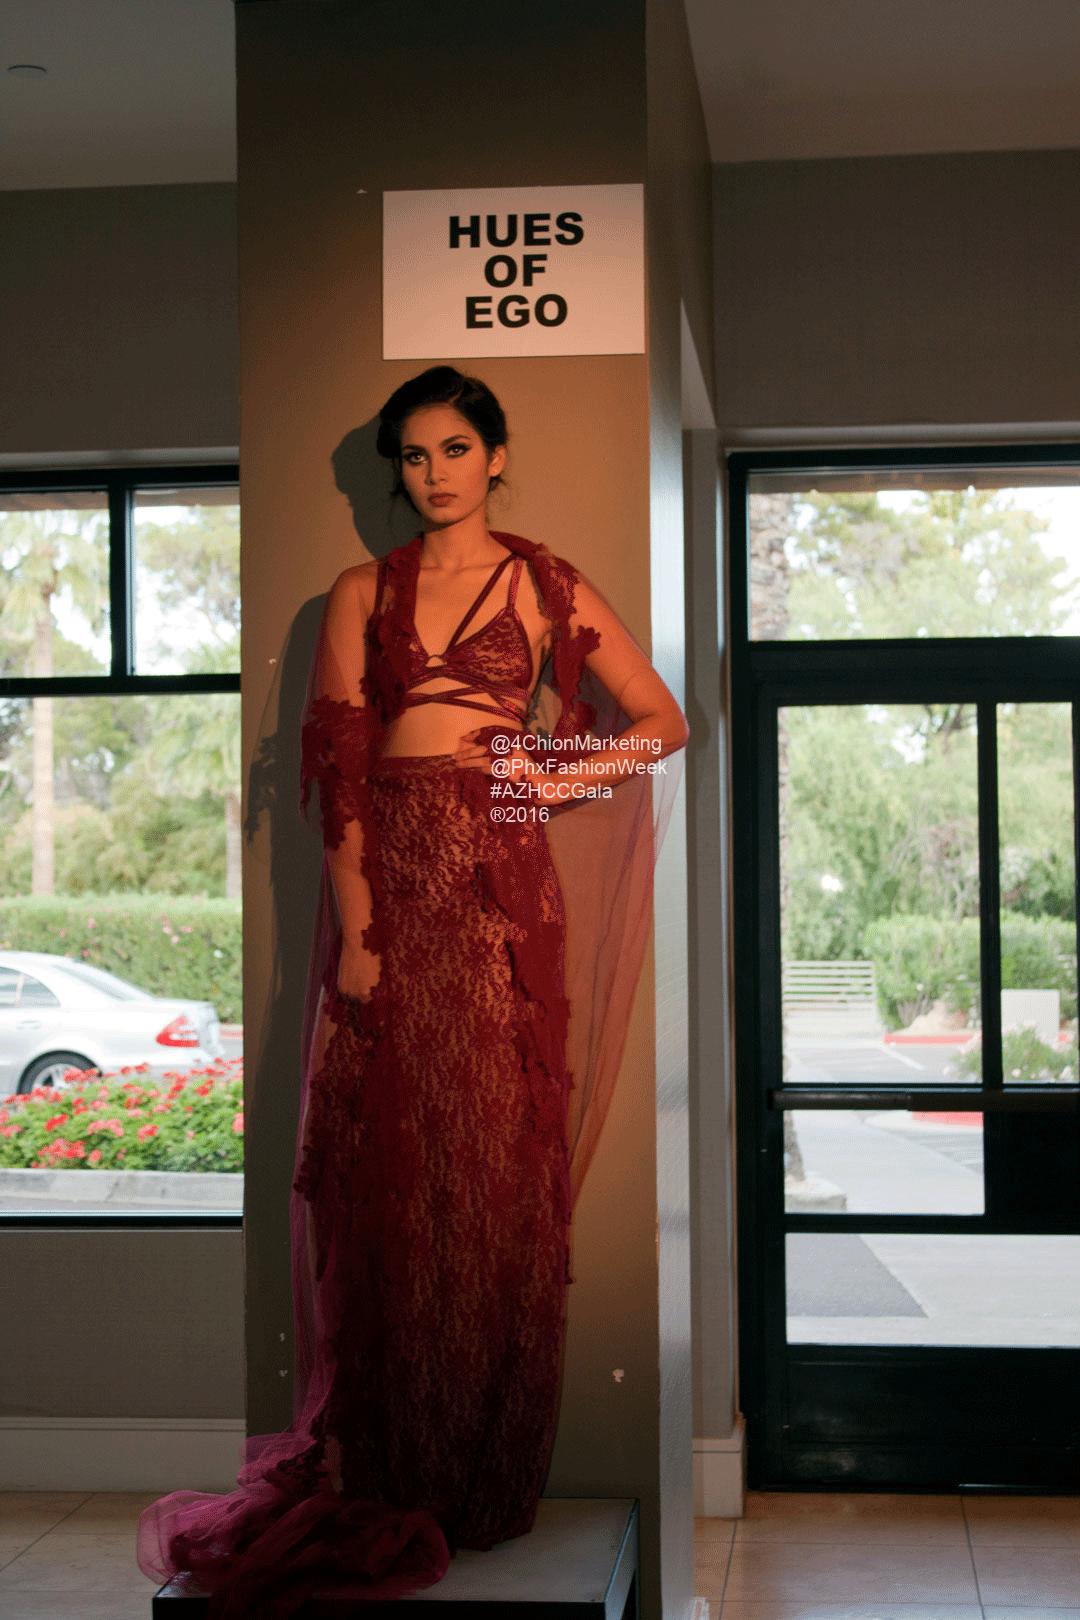 #AZHCCGala fabulous #redcarpet! #fashion #style #Phoenix #OTRC Arizona Biltmore, A Waldorf Astoria Resort Phoenix Fashion Week Azteca Bridal